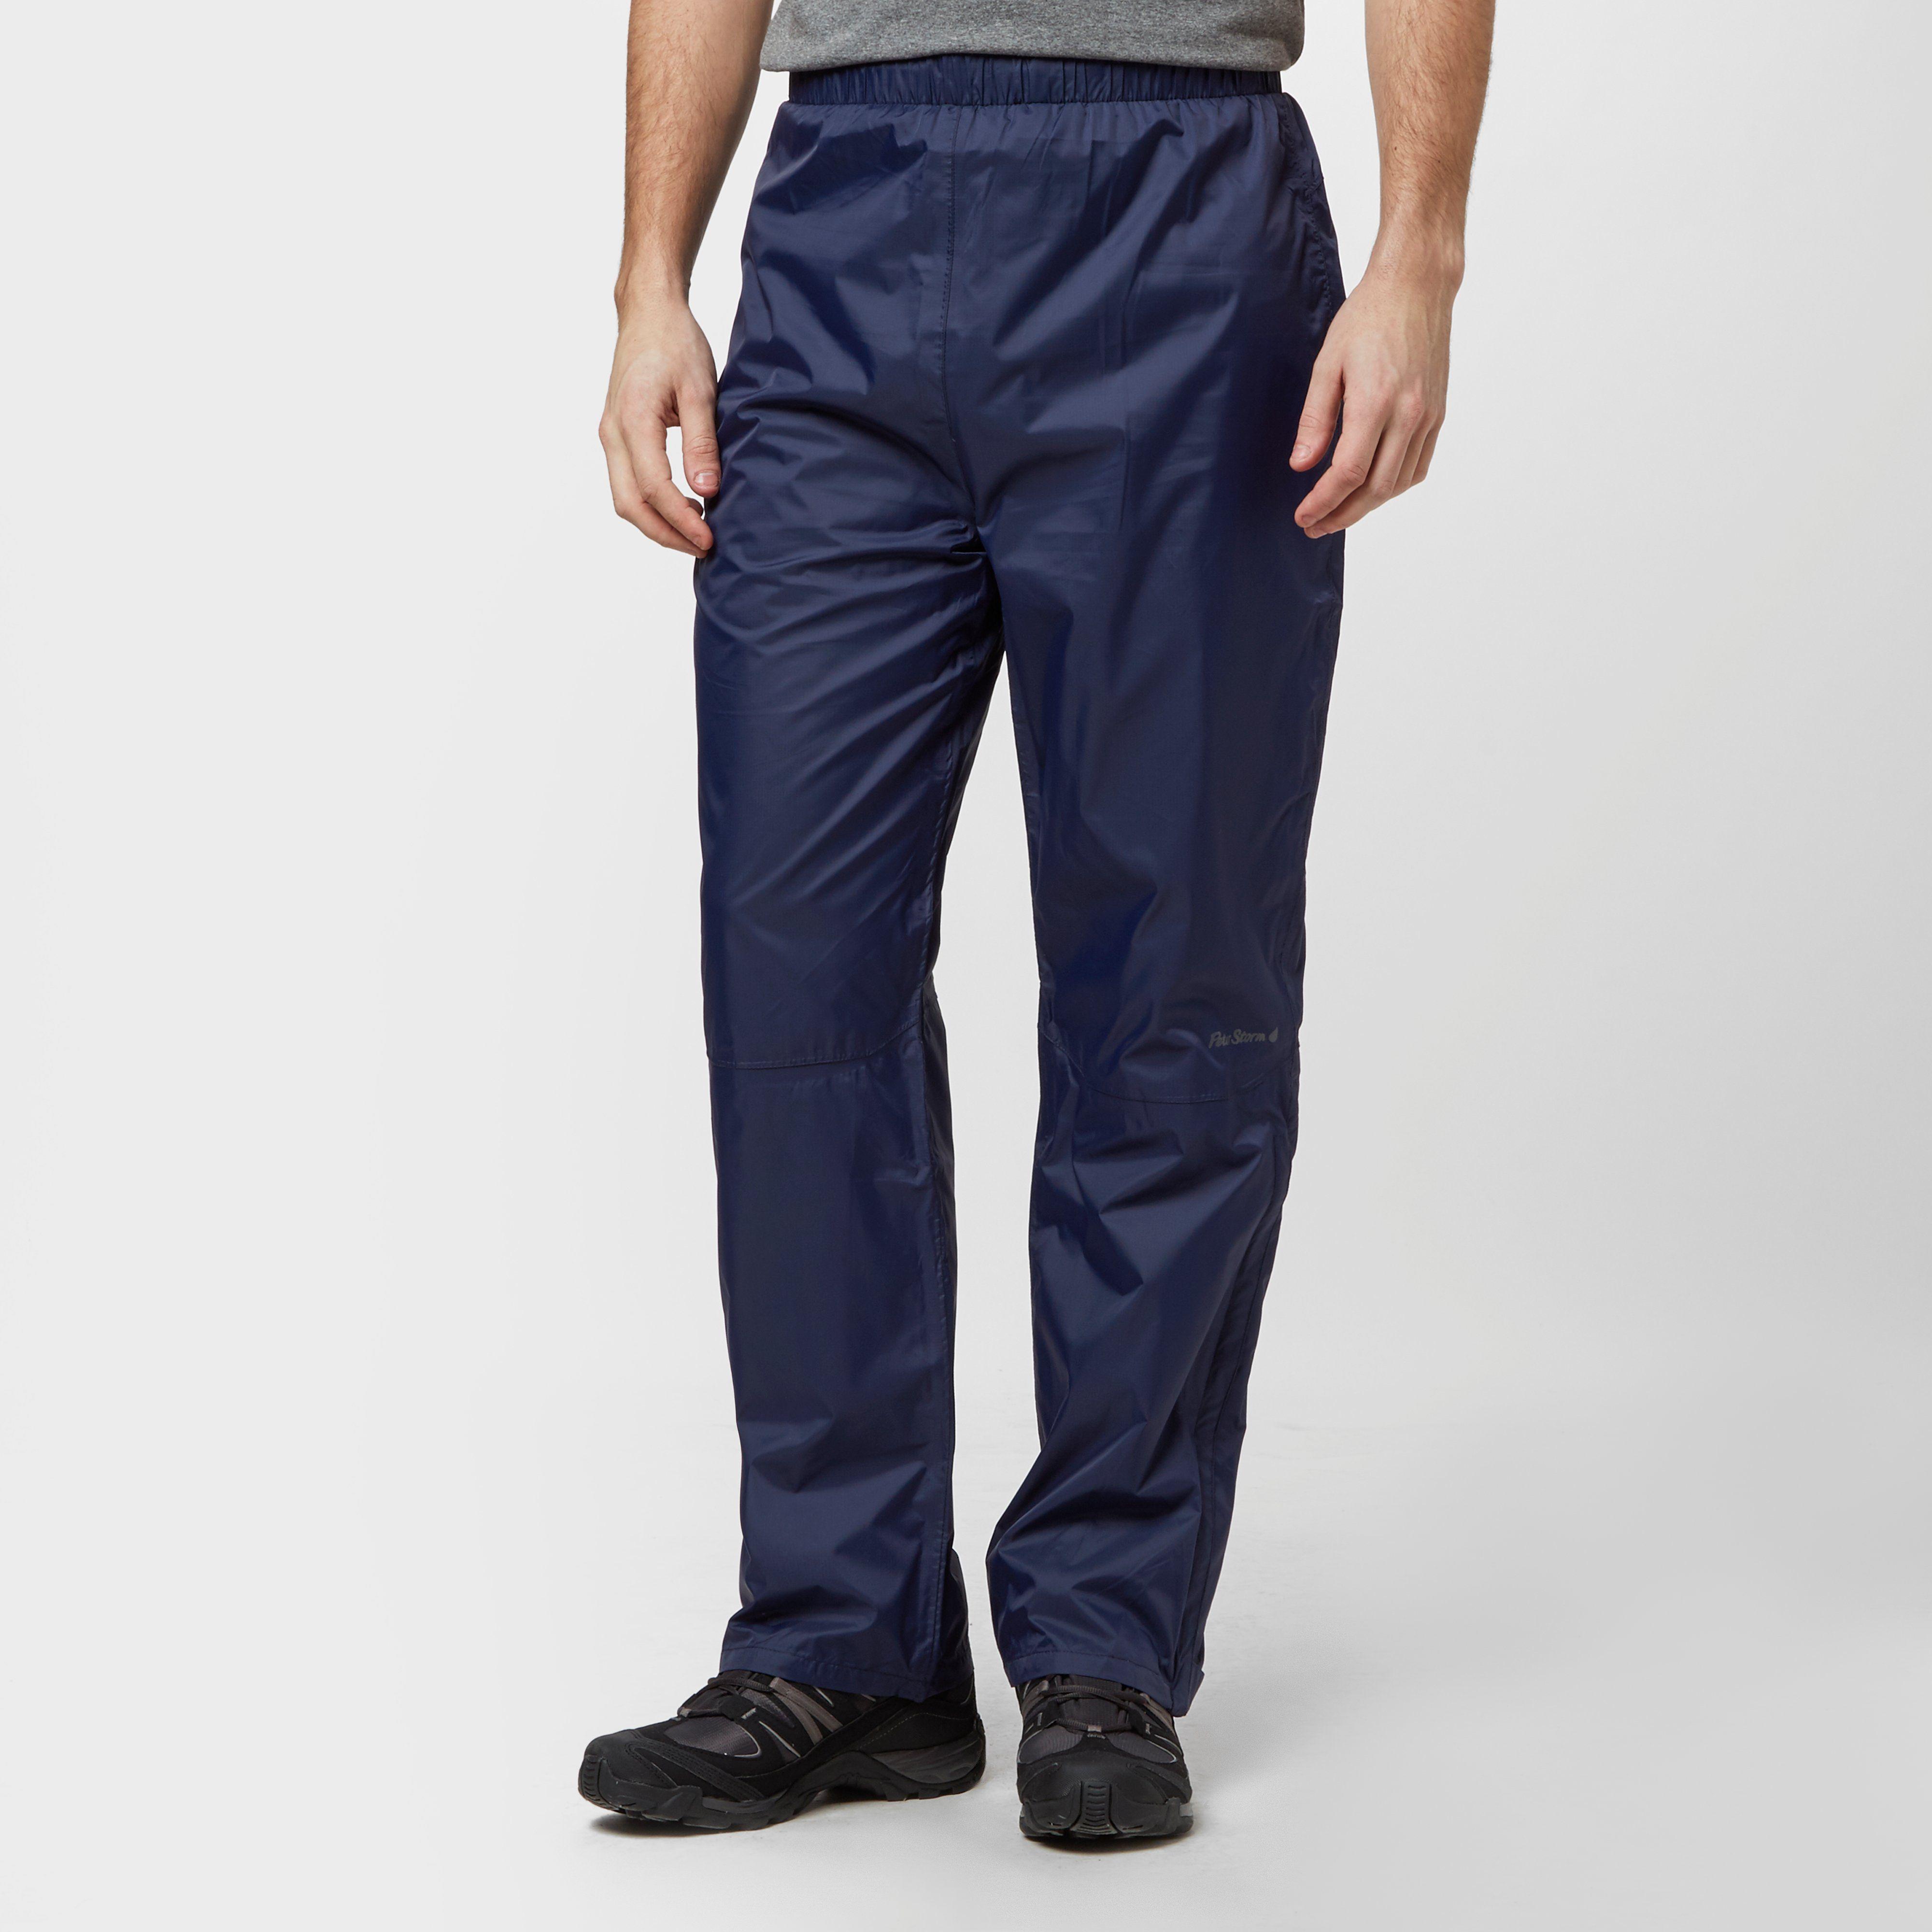 PETER STORM Men's Tempest Waterproof Trousers